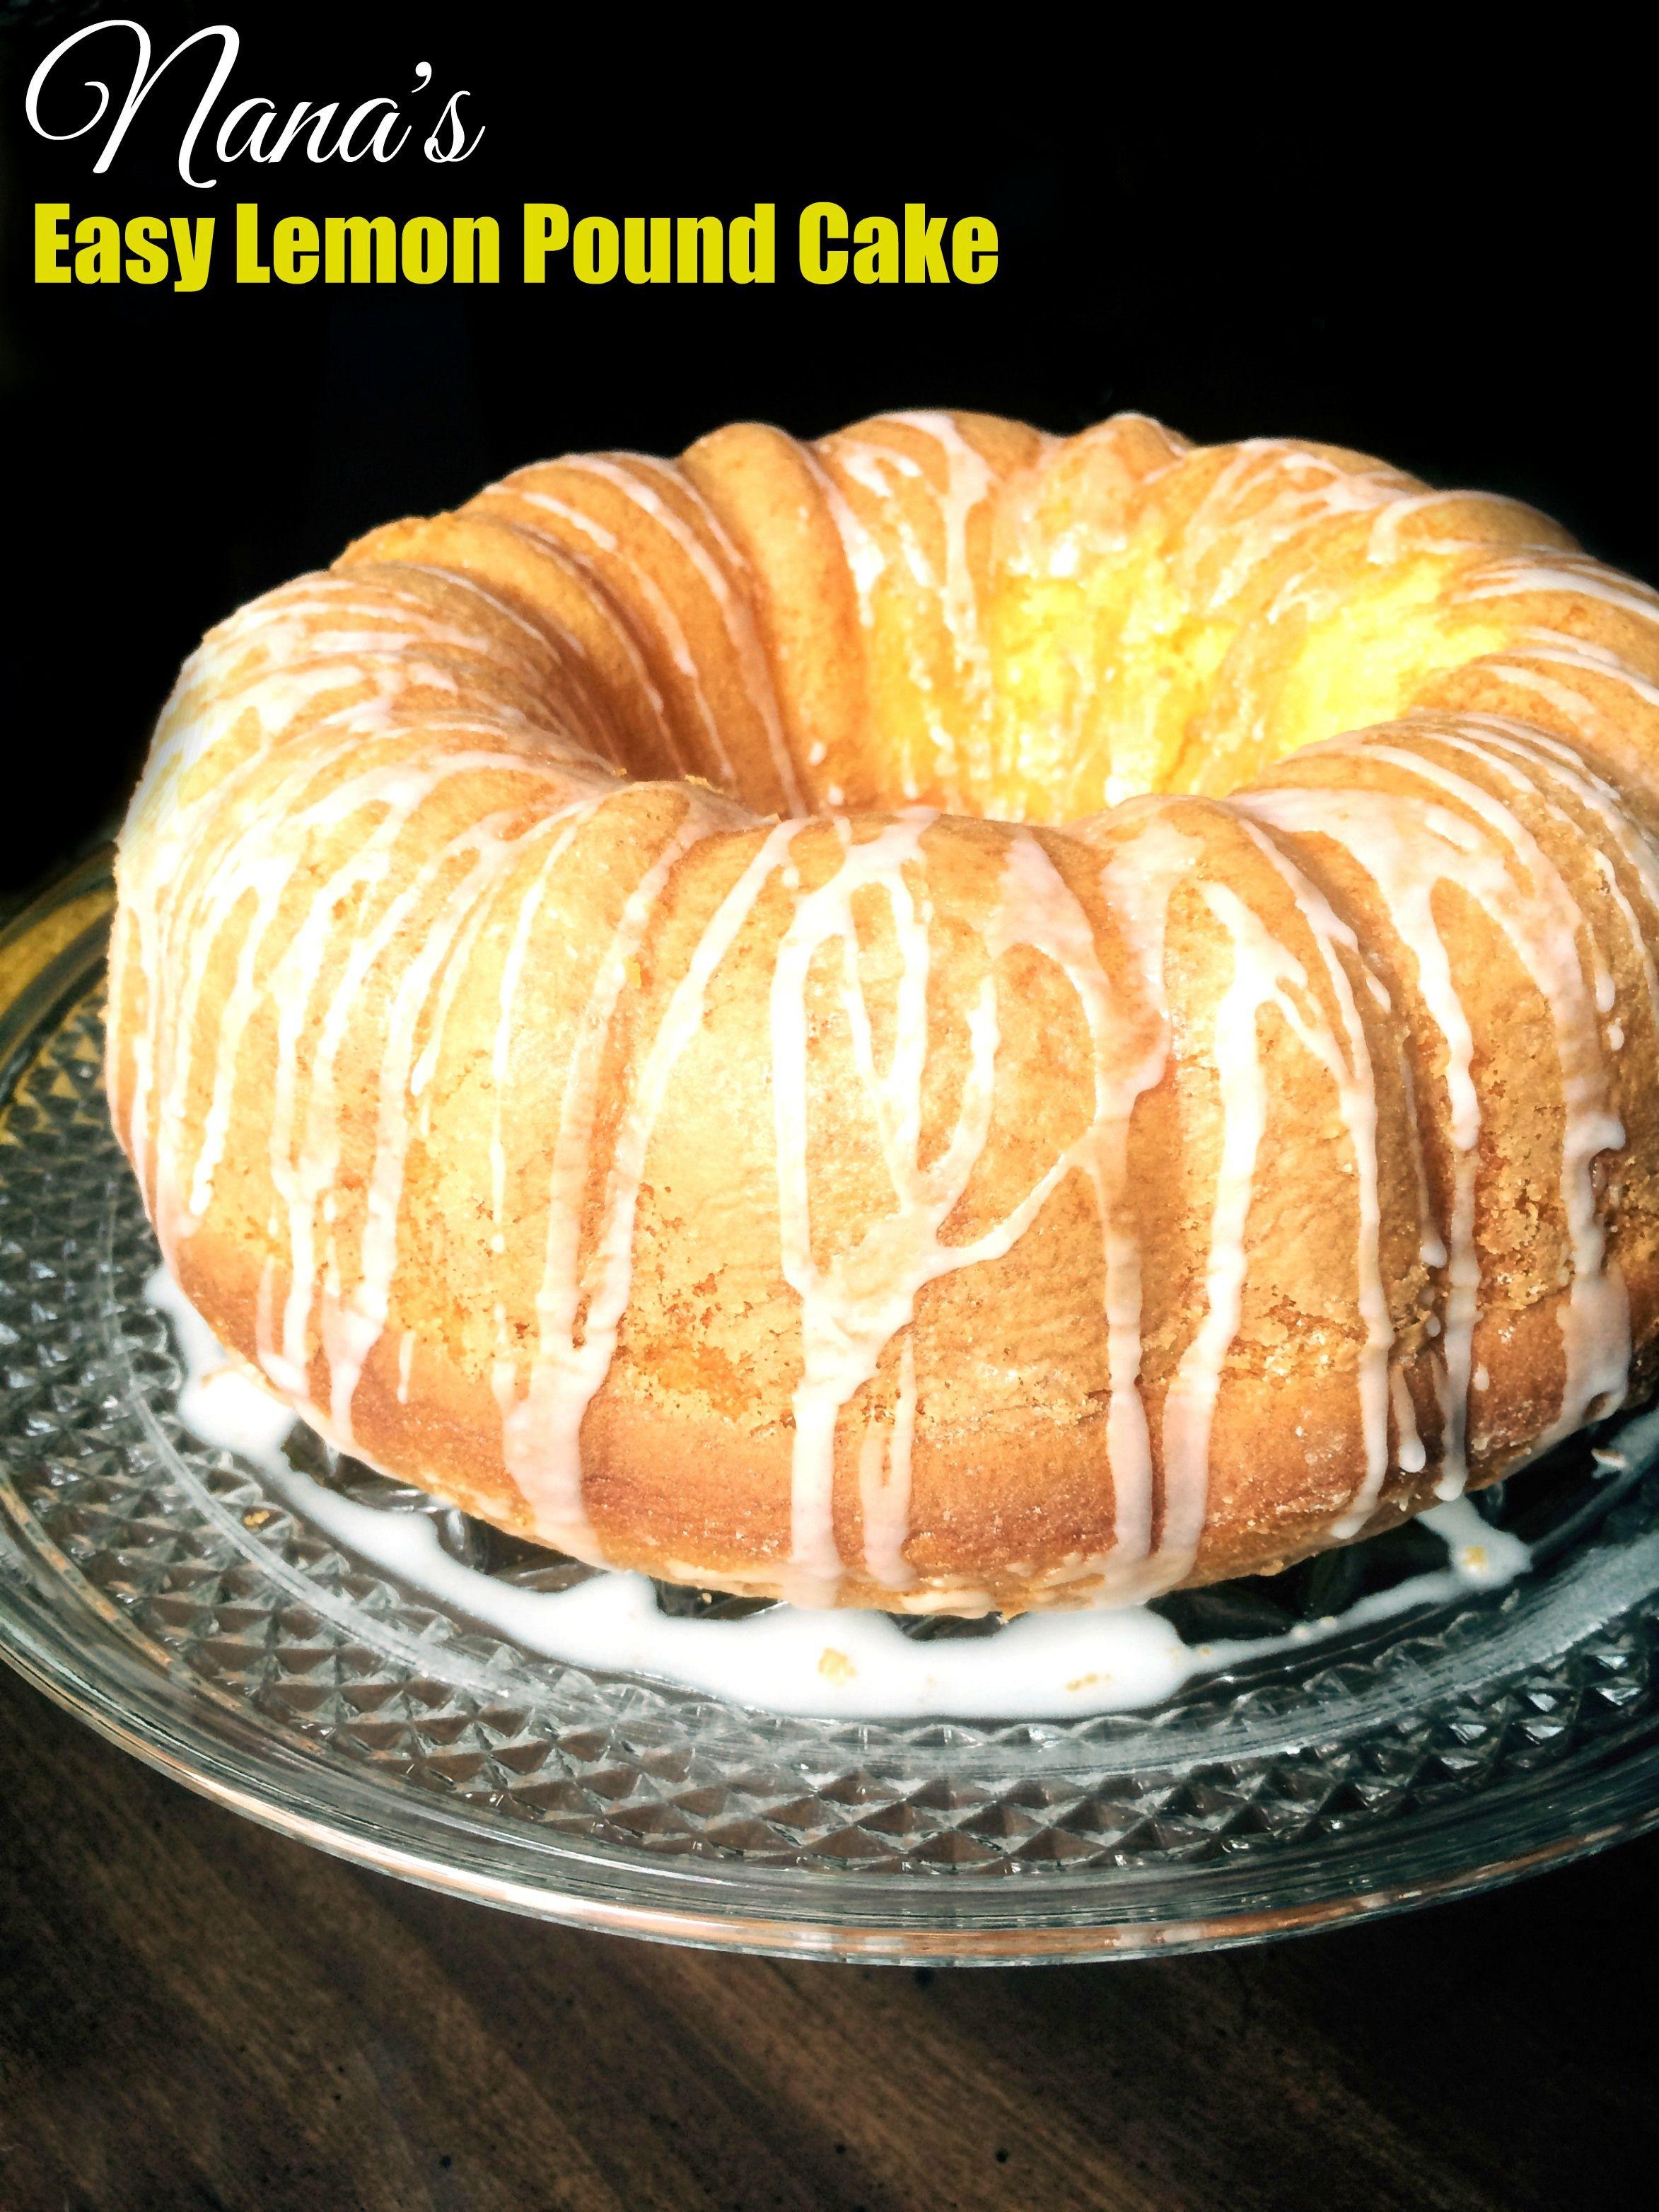 Nana S Easy Lemon Pound Cake Aunt Bee S Recipes Sounds Just